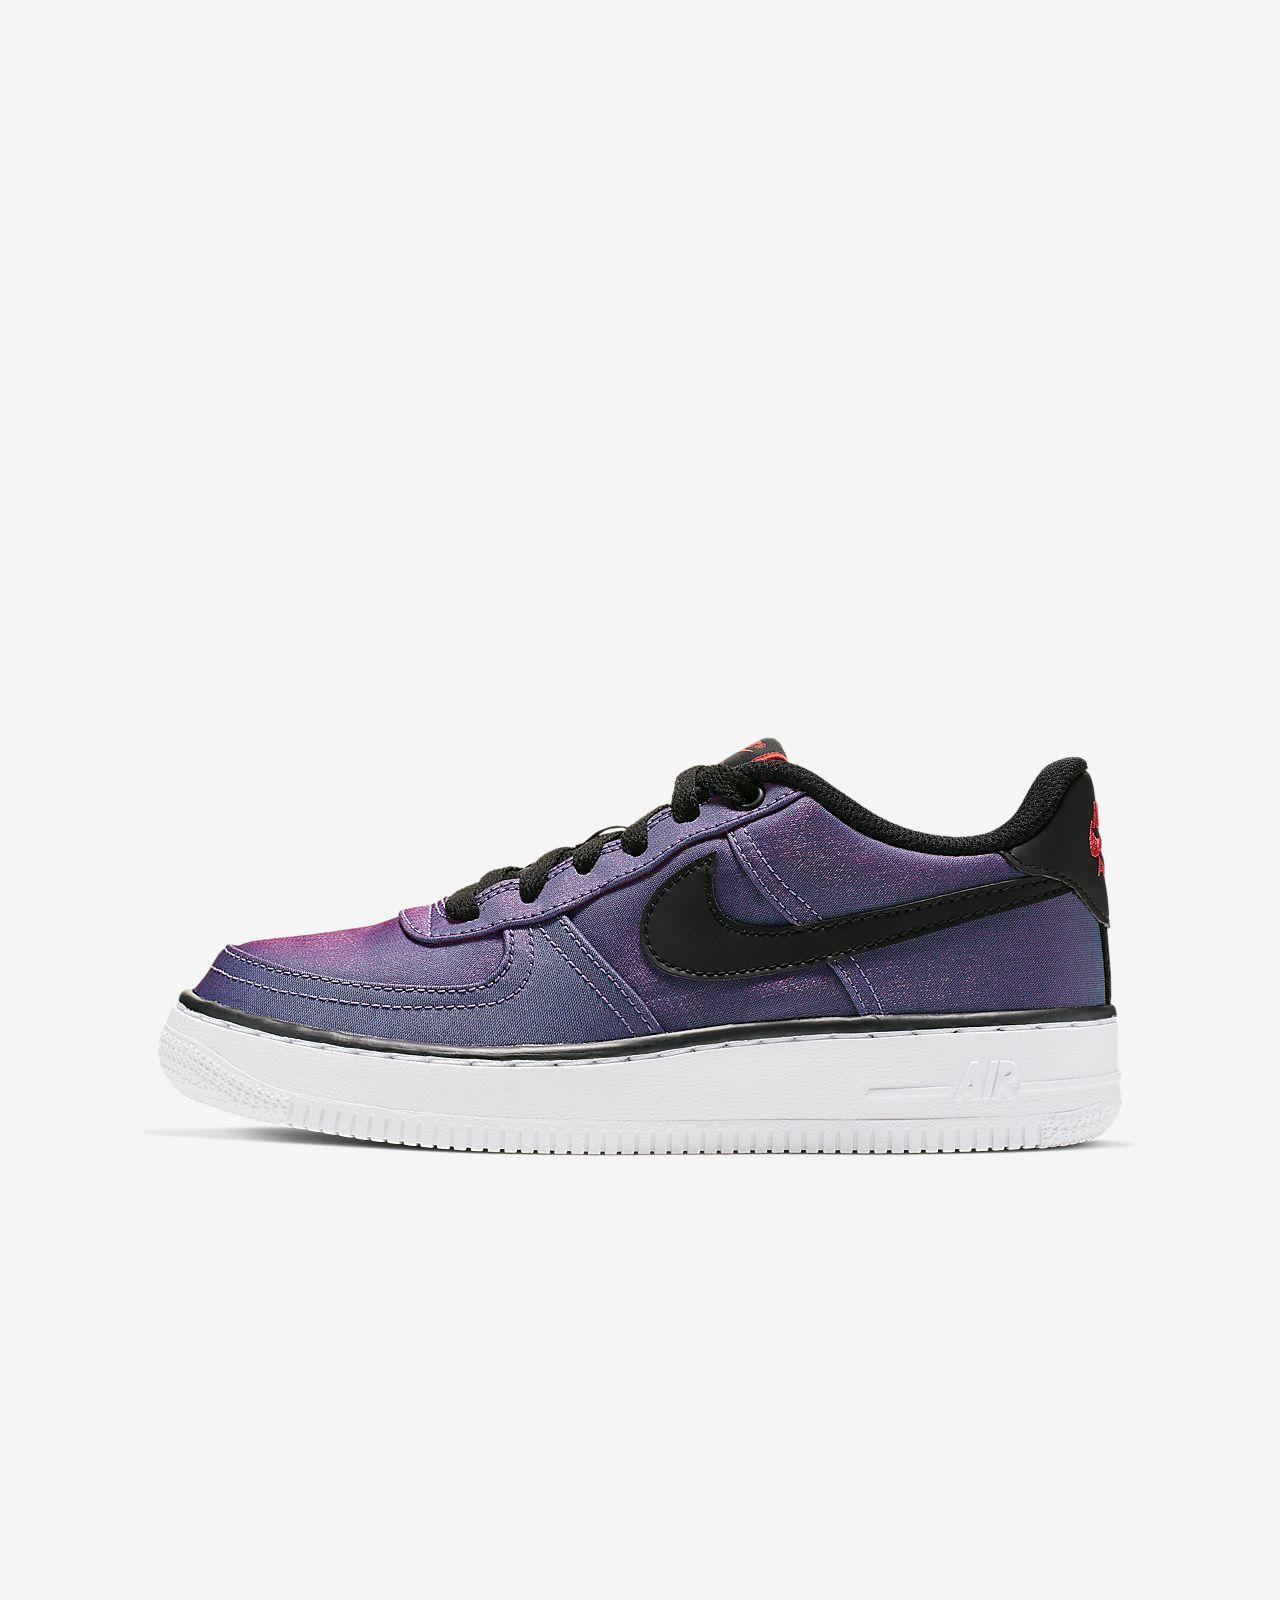 Nike Air Force 1 LV8 Shift Kinderschoen